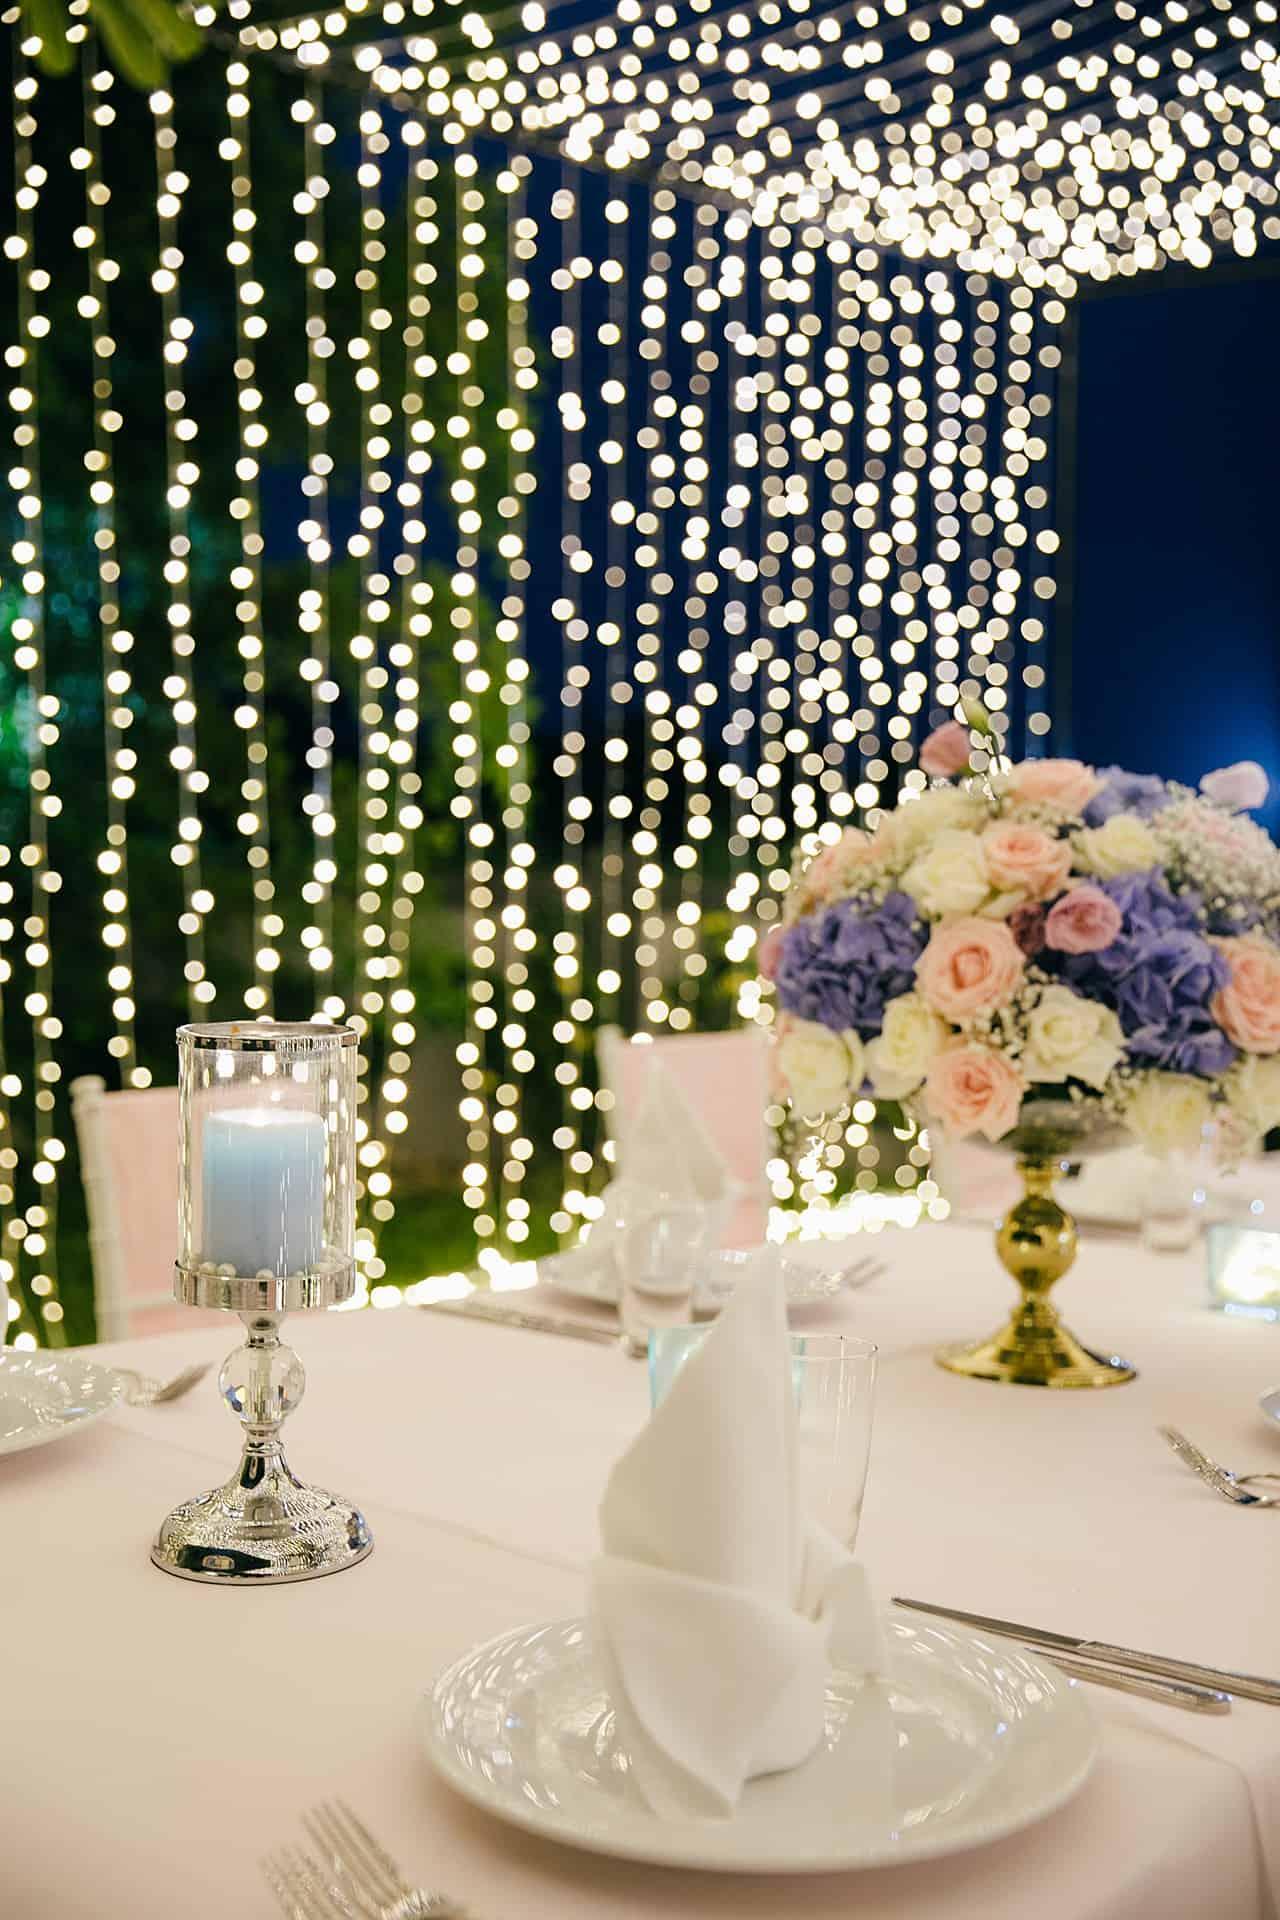 Wedding Haruka & Ronny, Hua Beach 8th September 2018 50